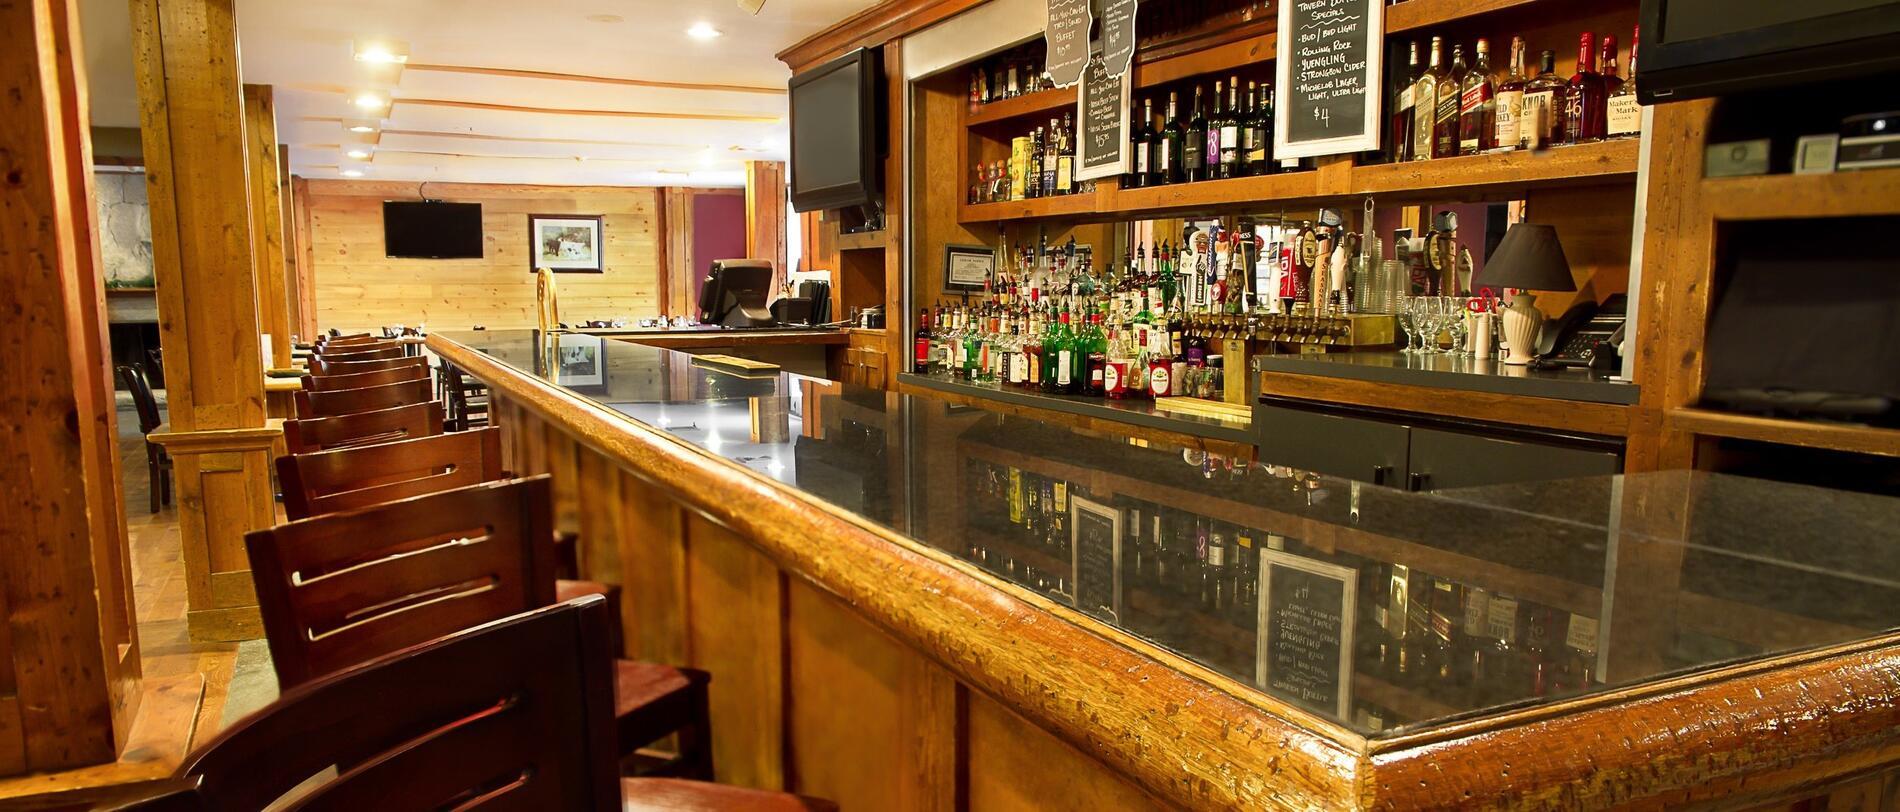 Hotel tavern bar